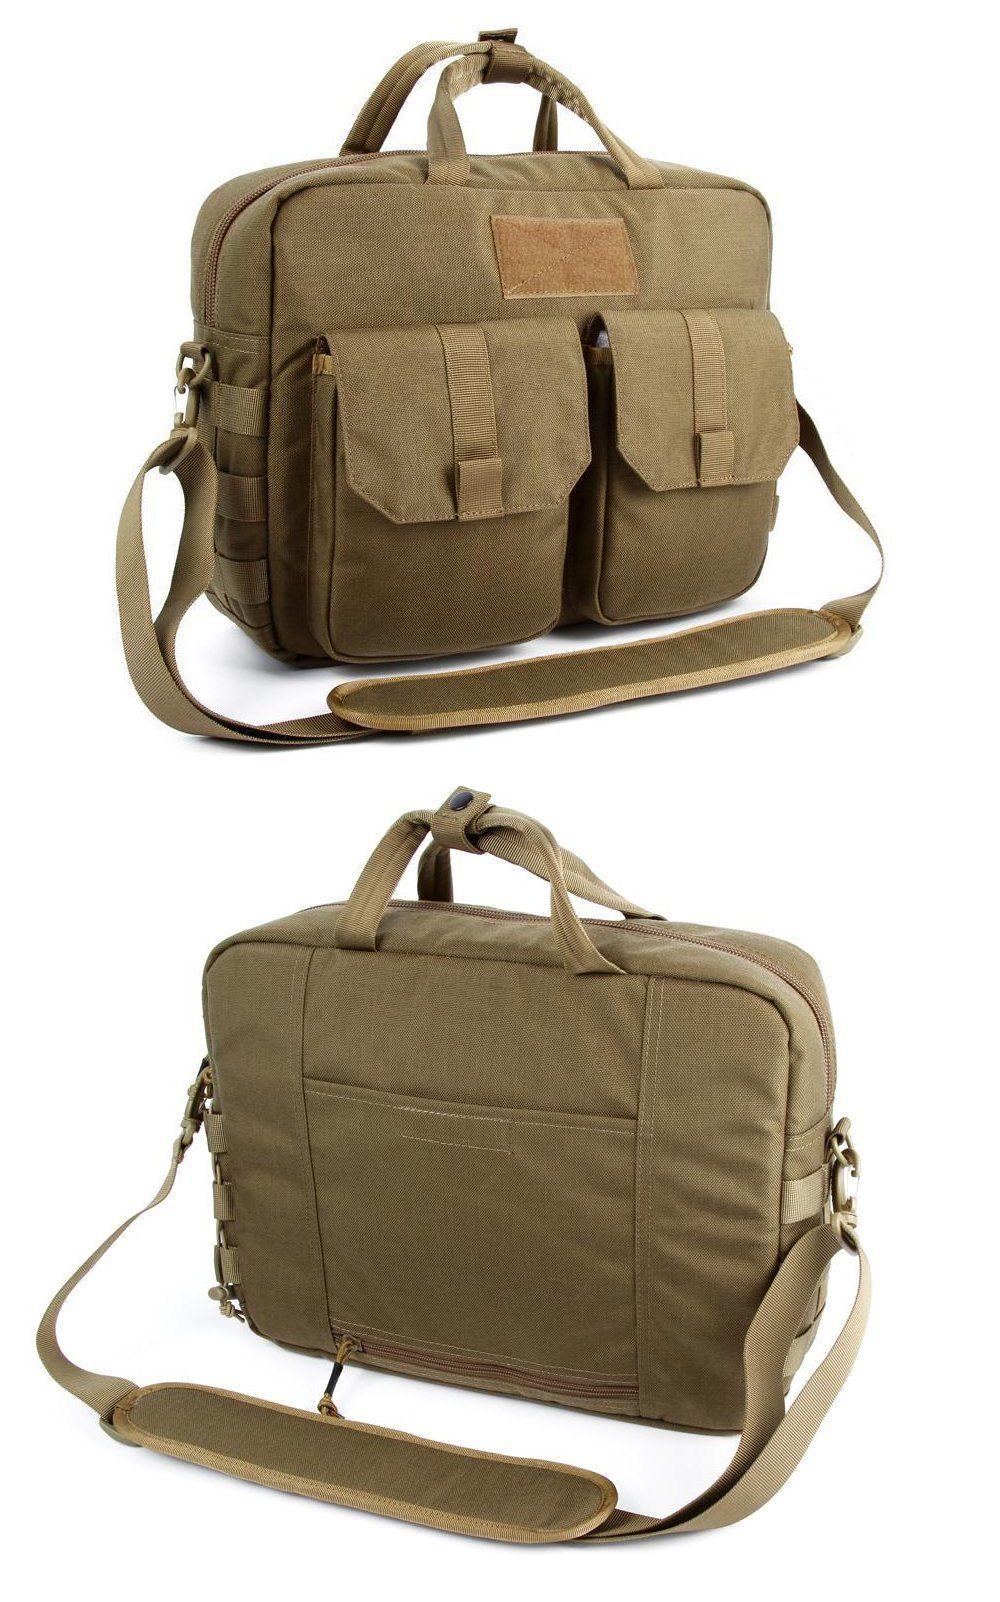 af698ccb73 Tactical MOLLE Single Shoulder Military Attache Case Briefcase Laptop Bag